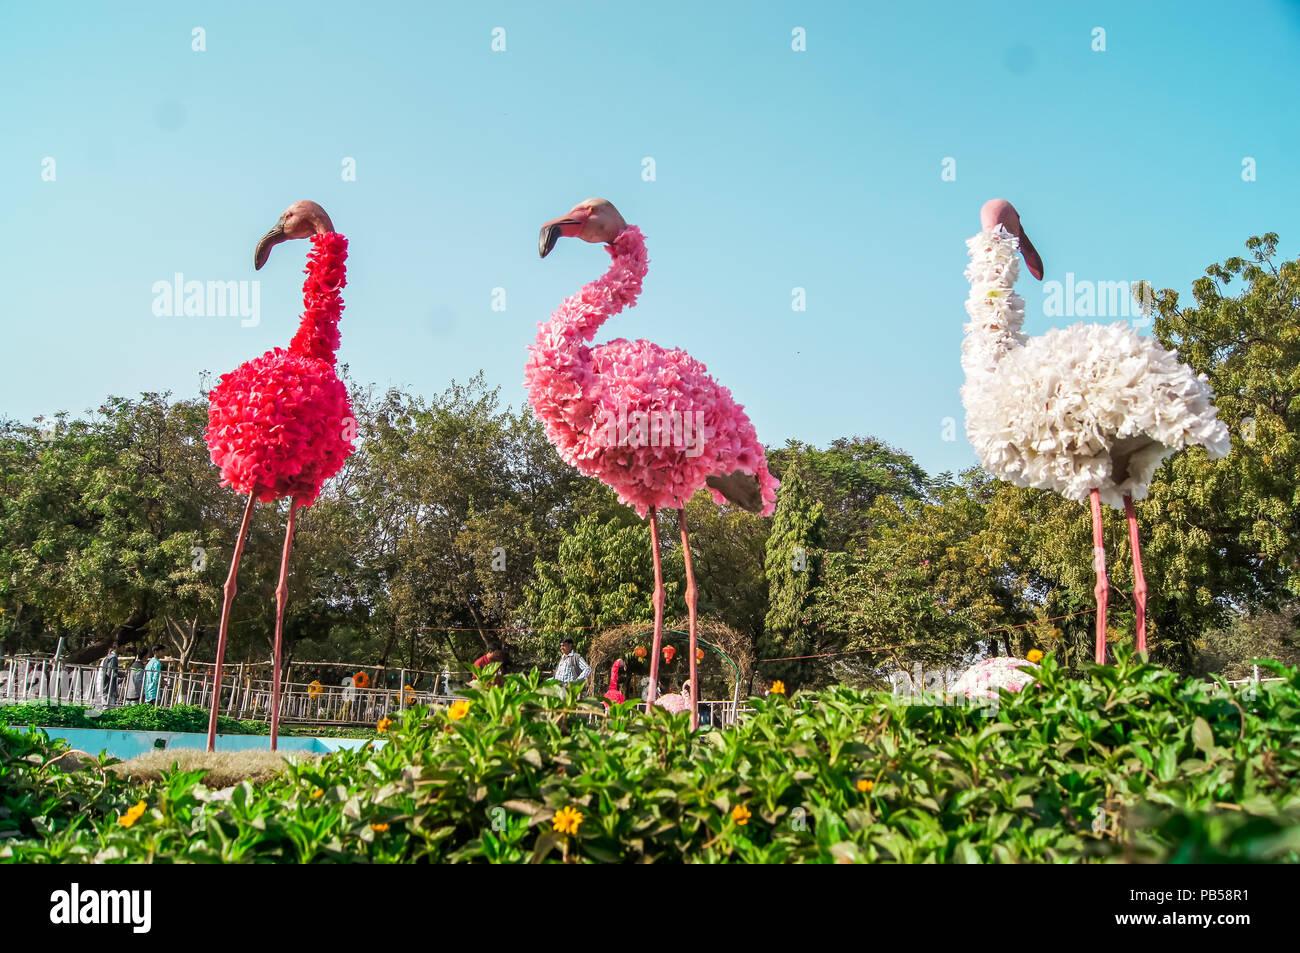 Beautiful flower arrangements and decoration in the garden beautiful flower arrangements and decoration in the garden beautiful flower arrangements and decoration in the garden izmirmasajfo